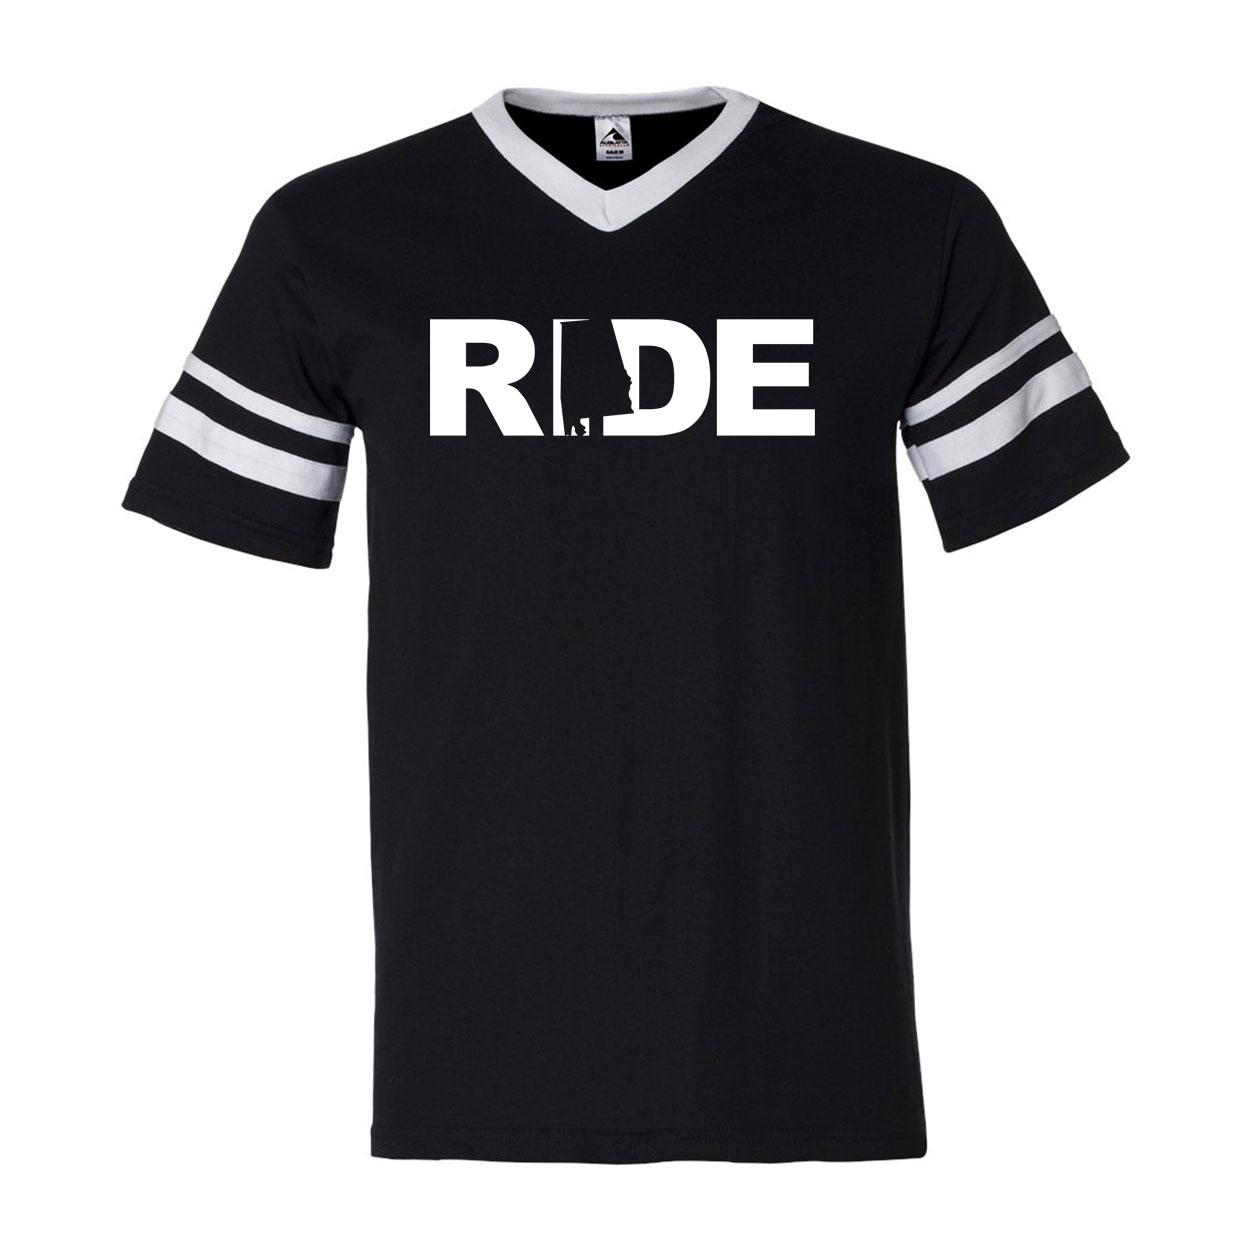 Ride Alabama Classic Premium Striped Jersey T-Shirt Black/White (White Logo)